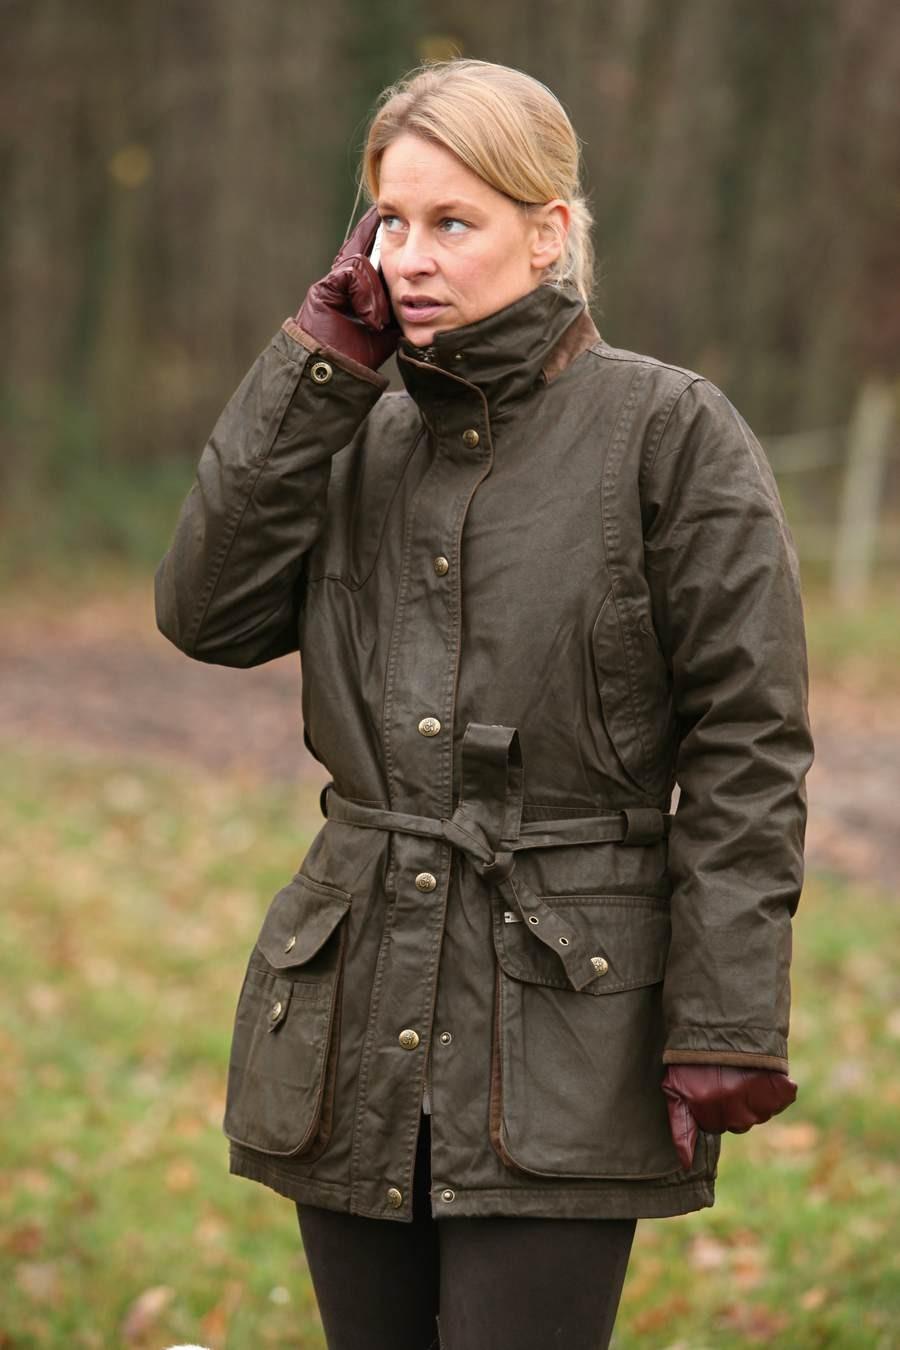 Damen-Wachsjacke *Celestine* ein Mode-Klassiker - Waidfrau-Blog